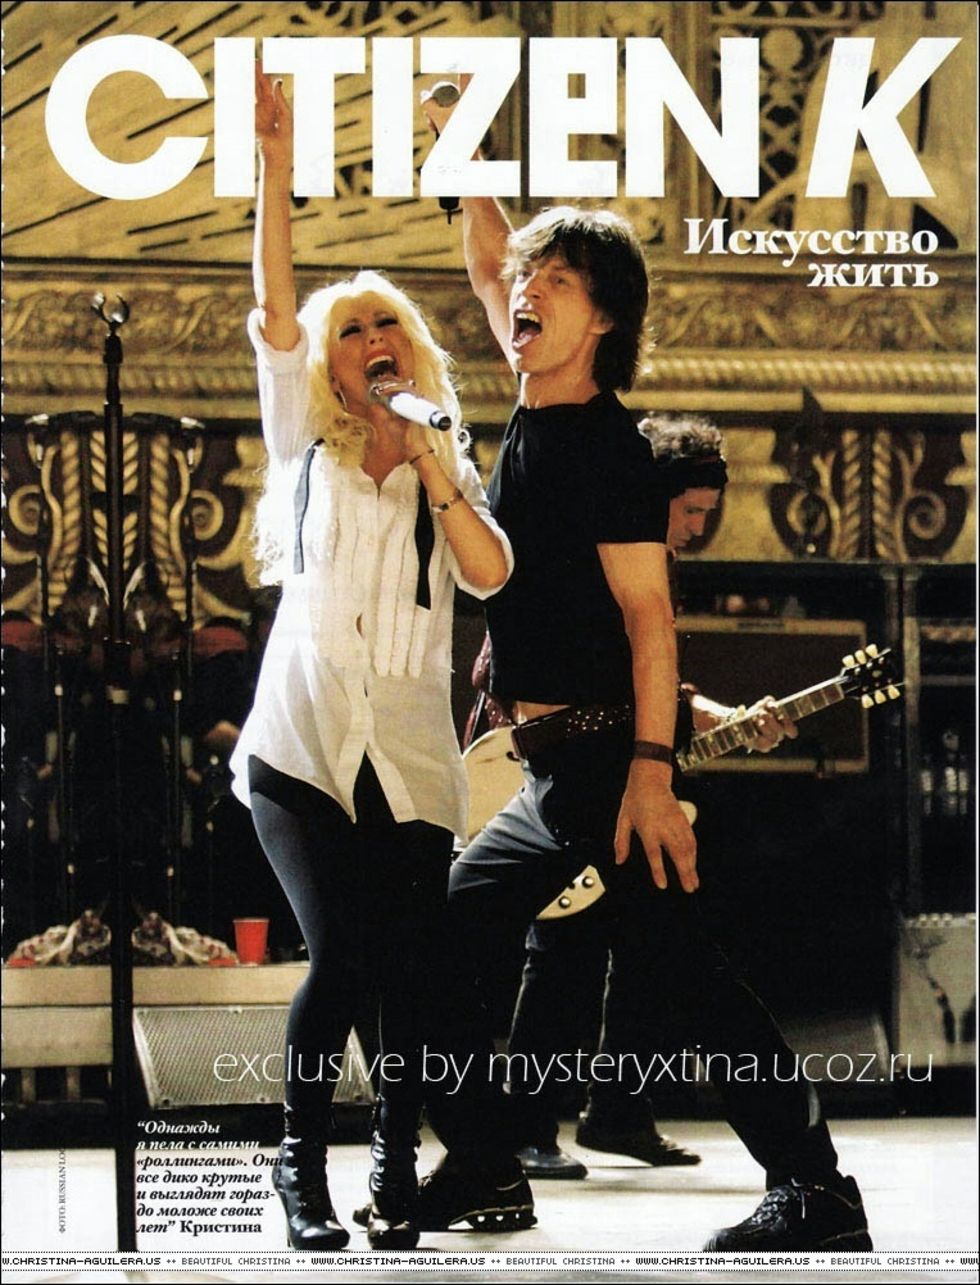 christina-aguilera-citizen-k-magazine-fallwinter-2008-01